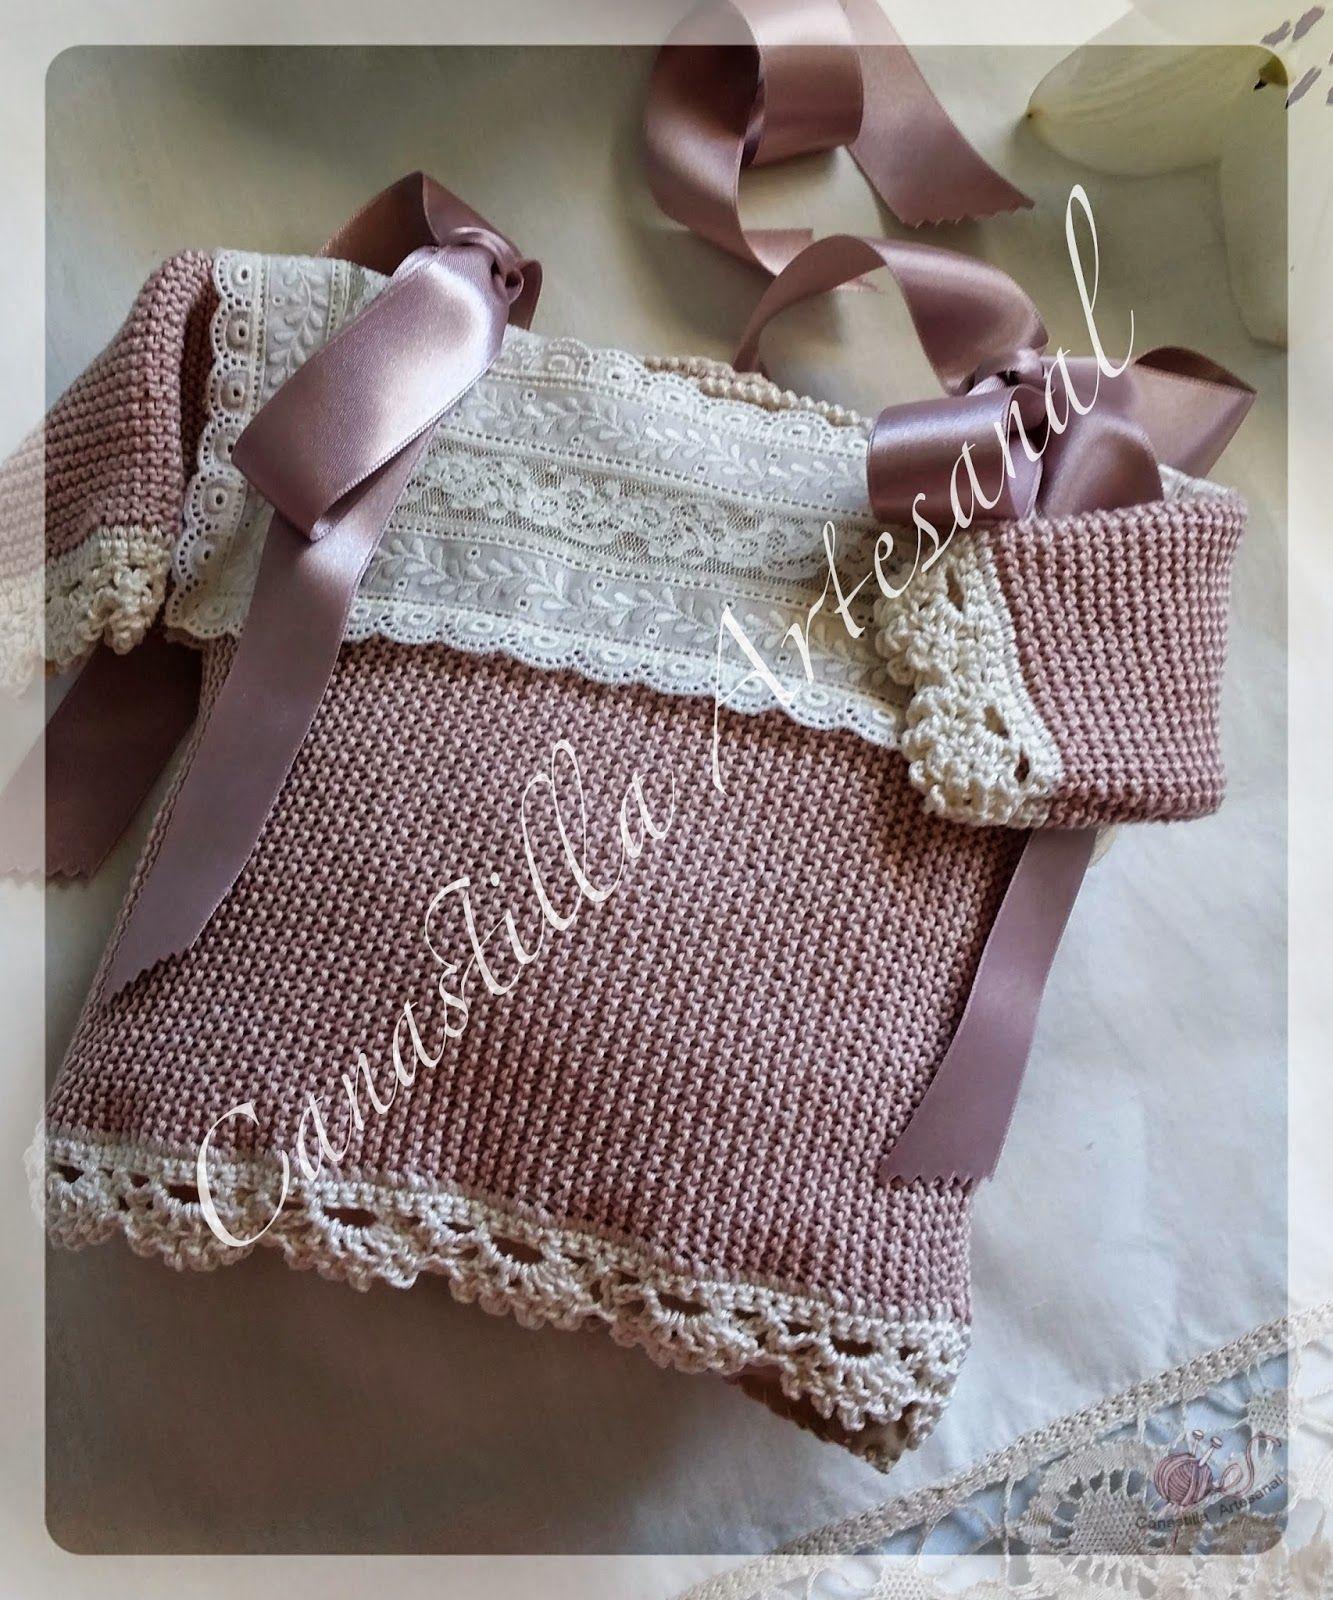 Canastilla artesanal capotas bebes pinterest babies - Canastilla artesanal bebe ...